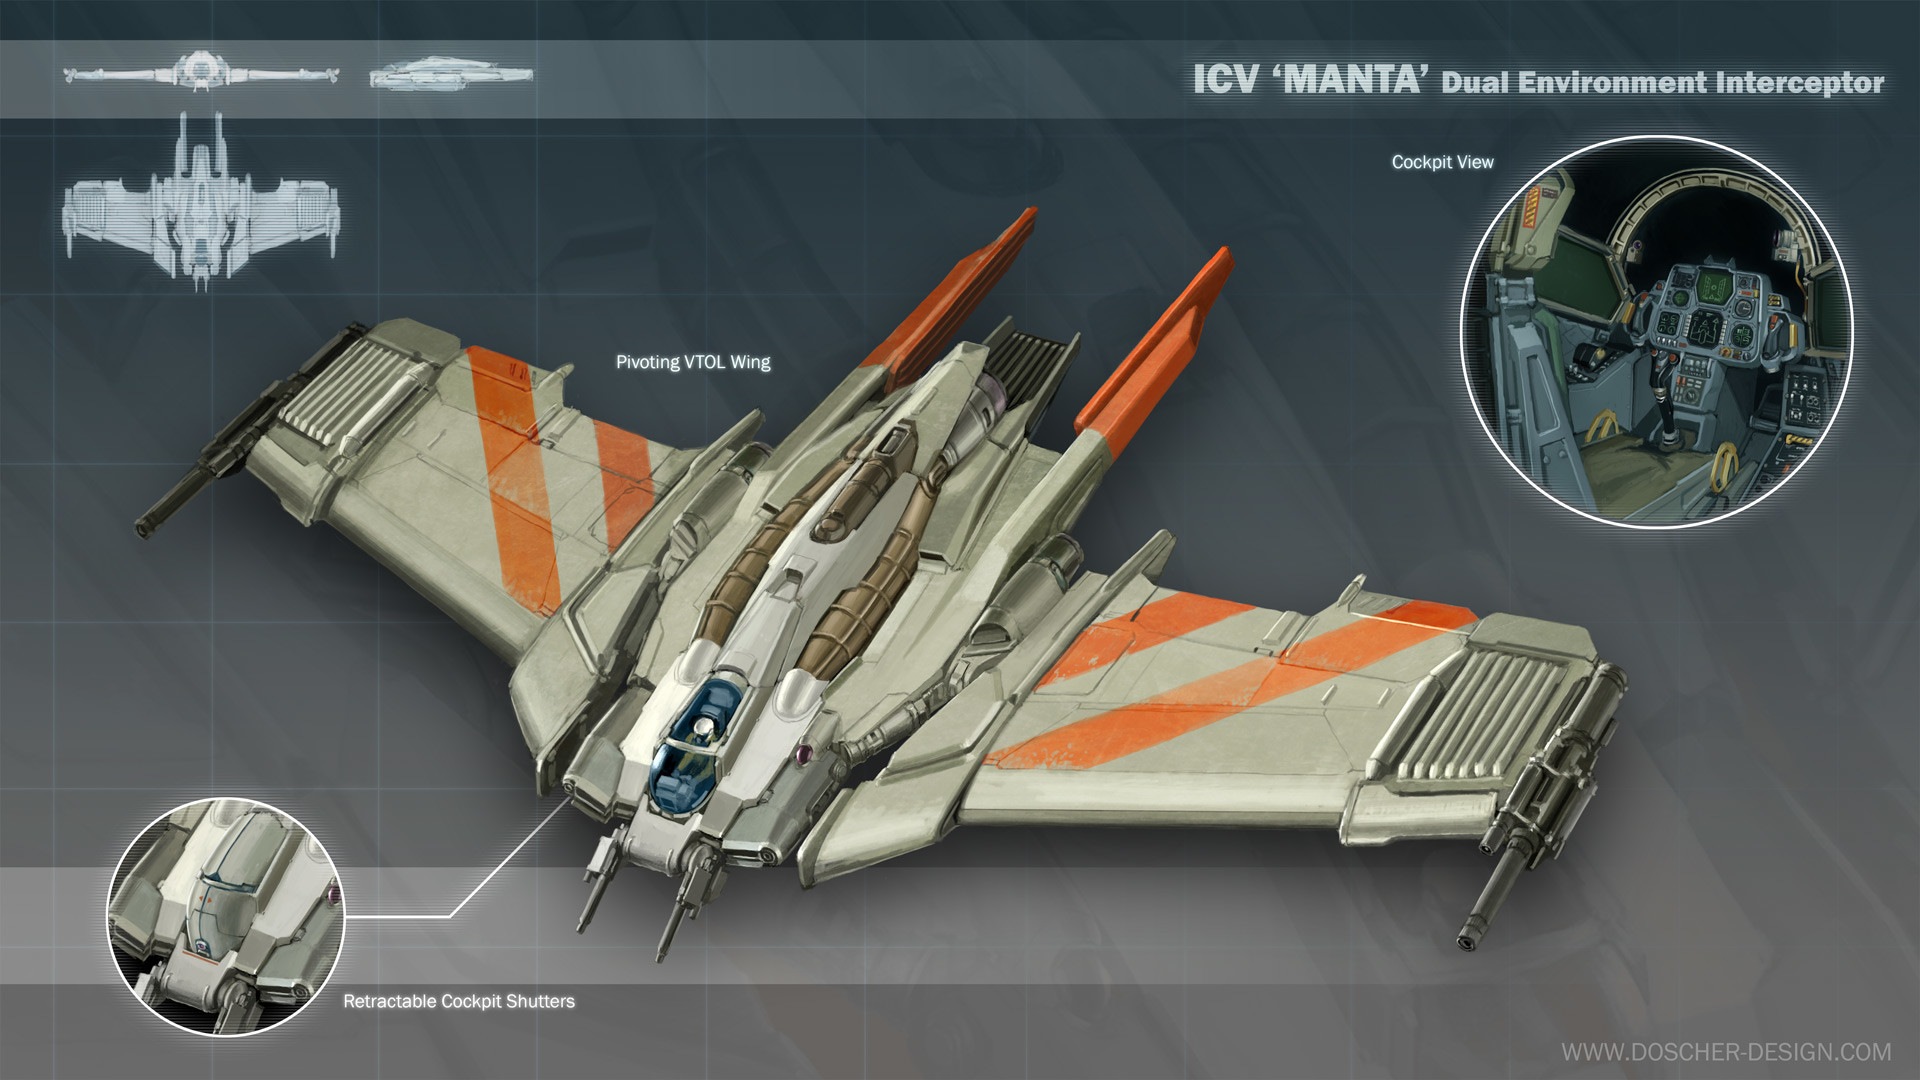 ICV 'Manta' Interceptor